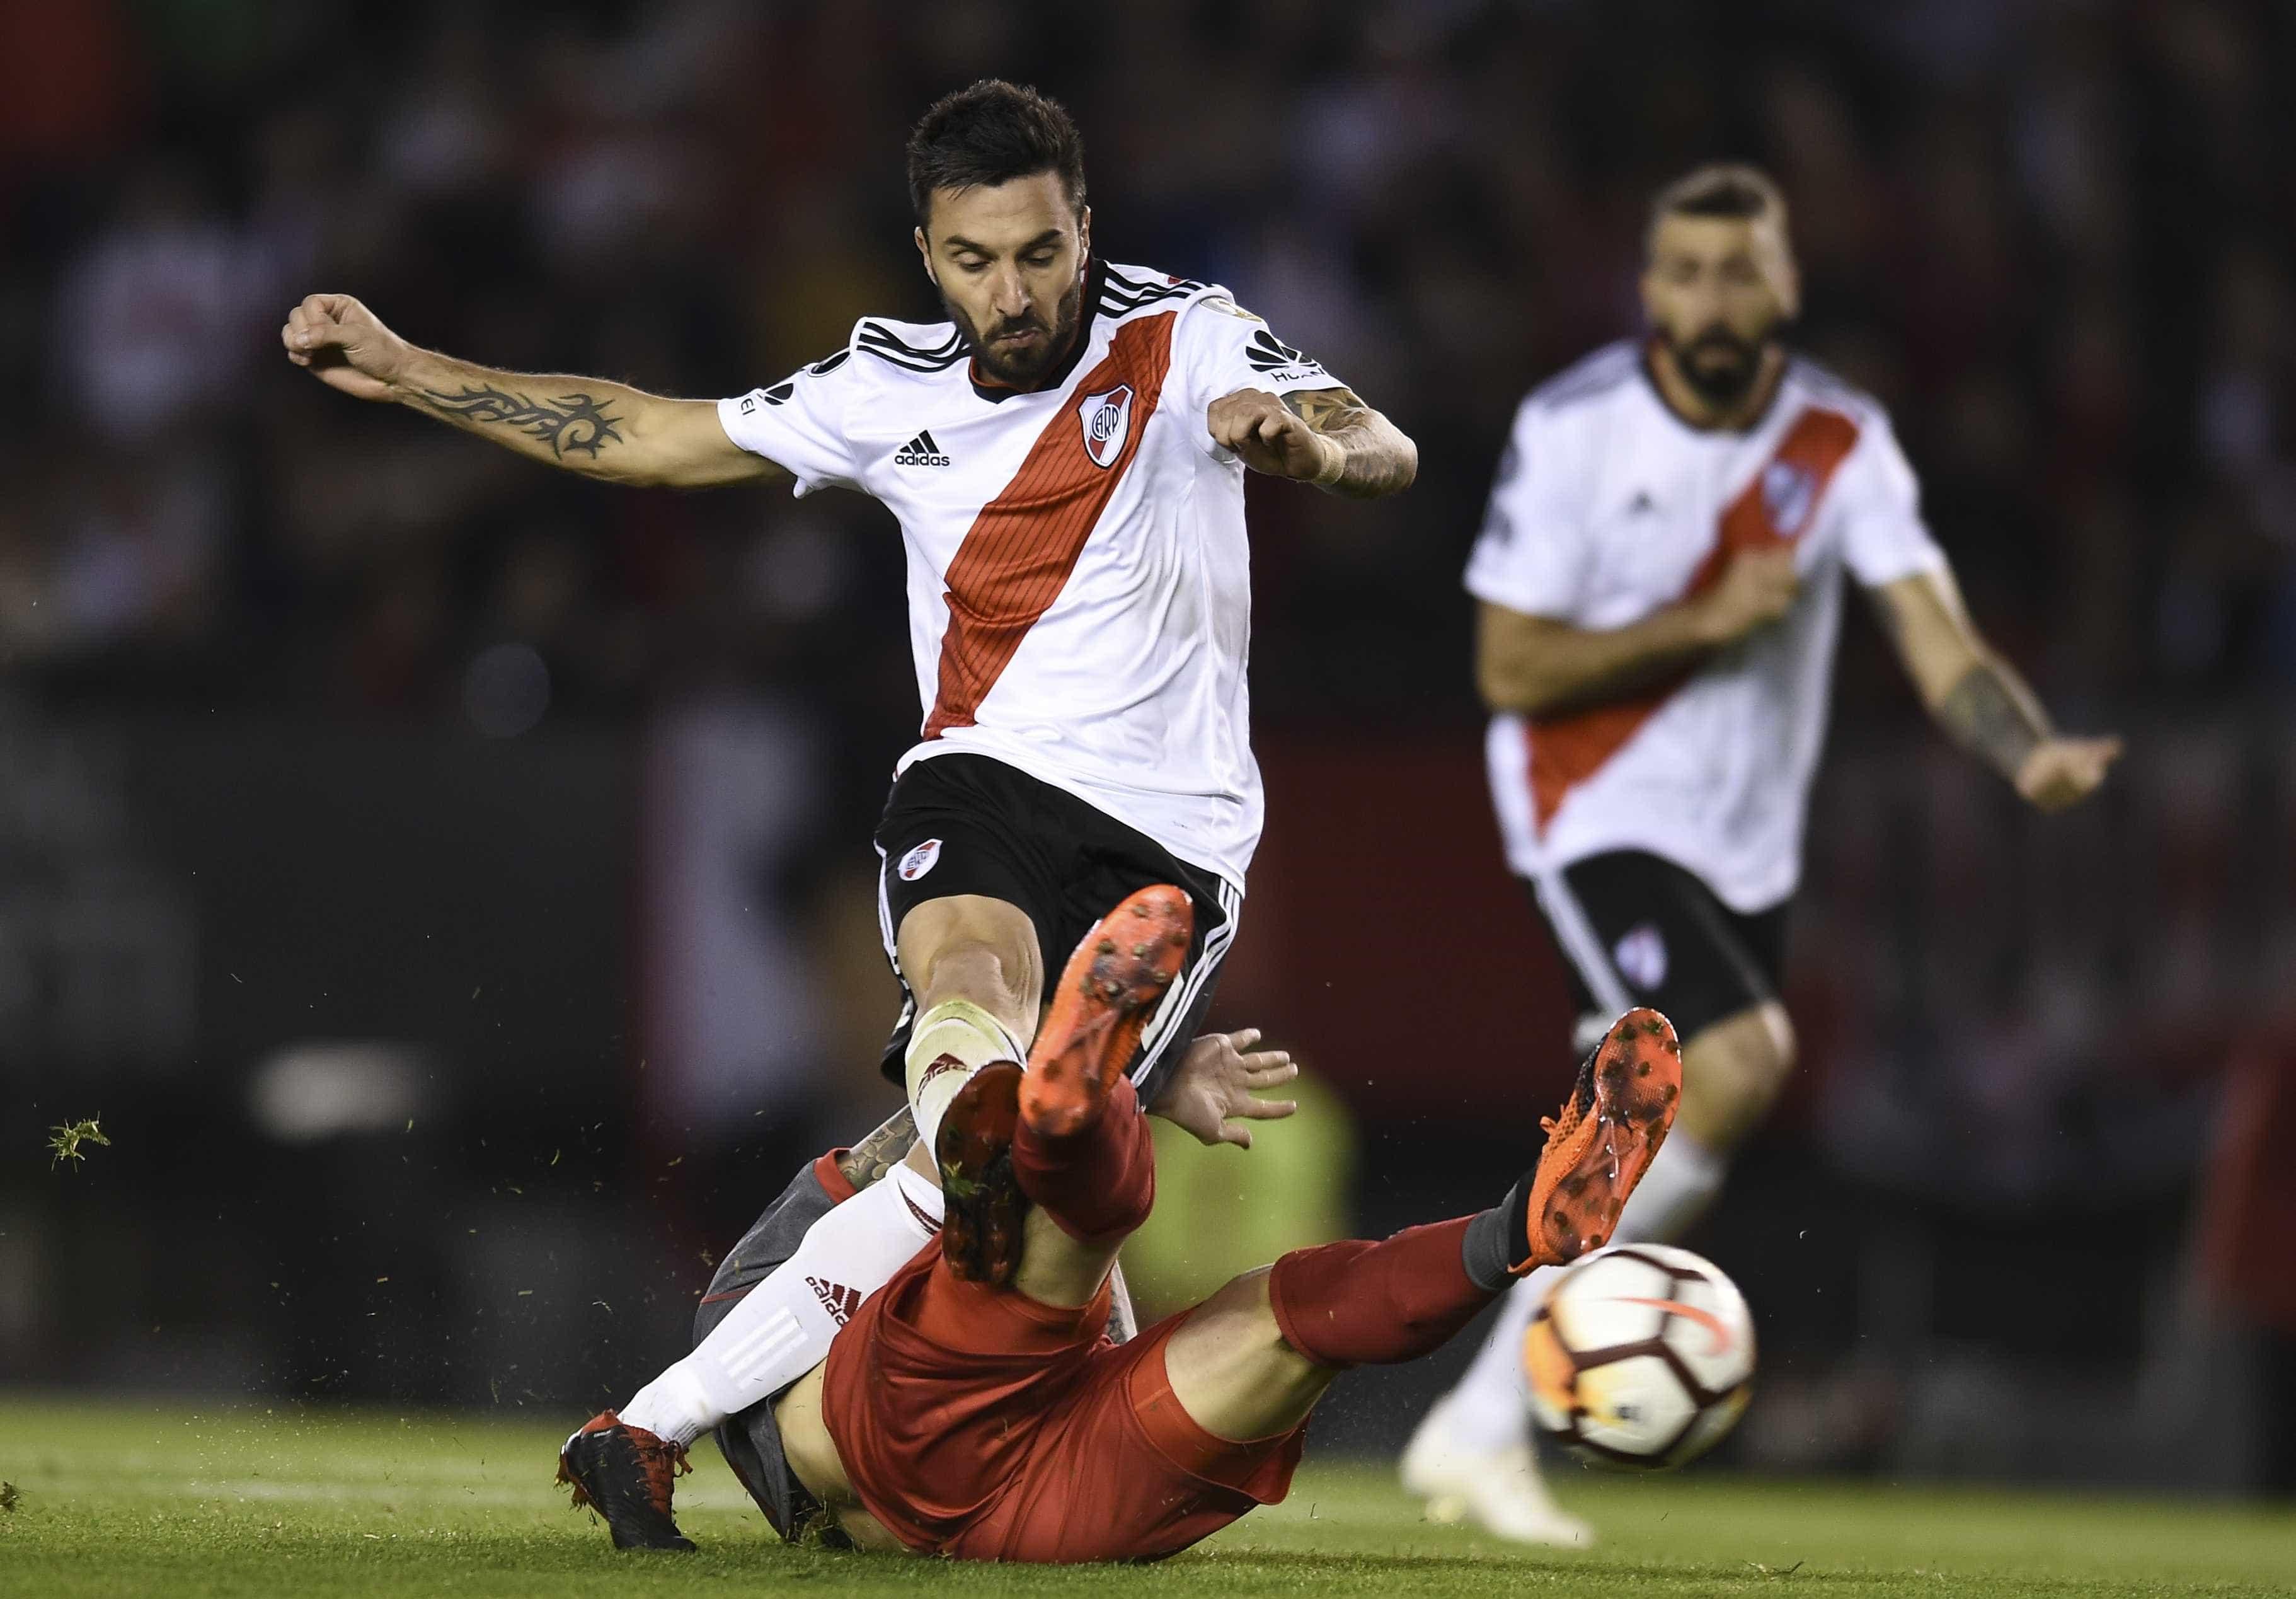 River vence Independiente e se classifica para a semi da Libertadores